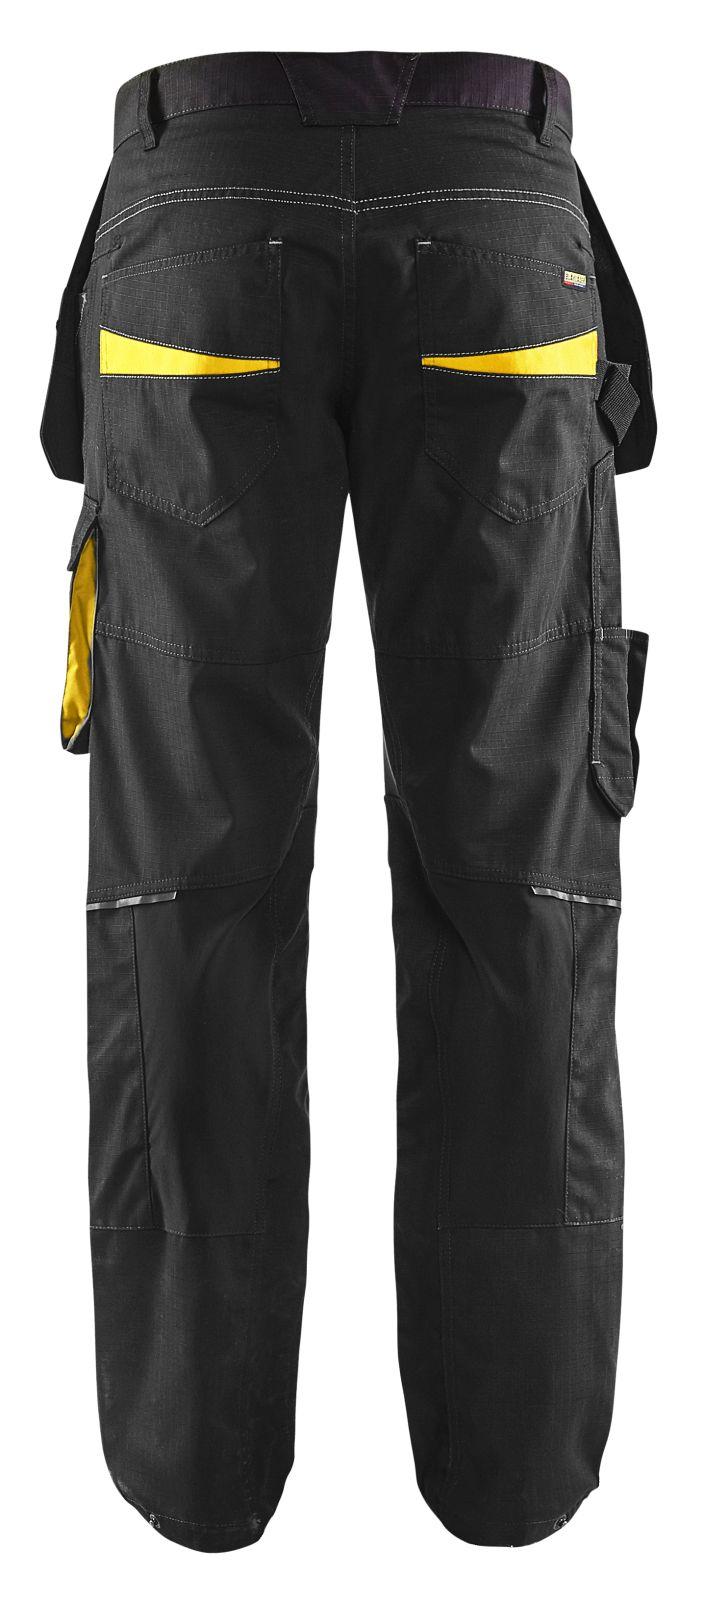 Blaklader Werkbroeken 14961330 zwart-geel(9933)